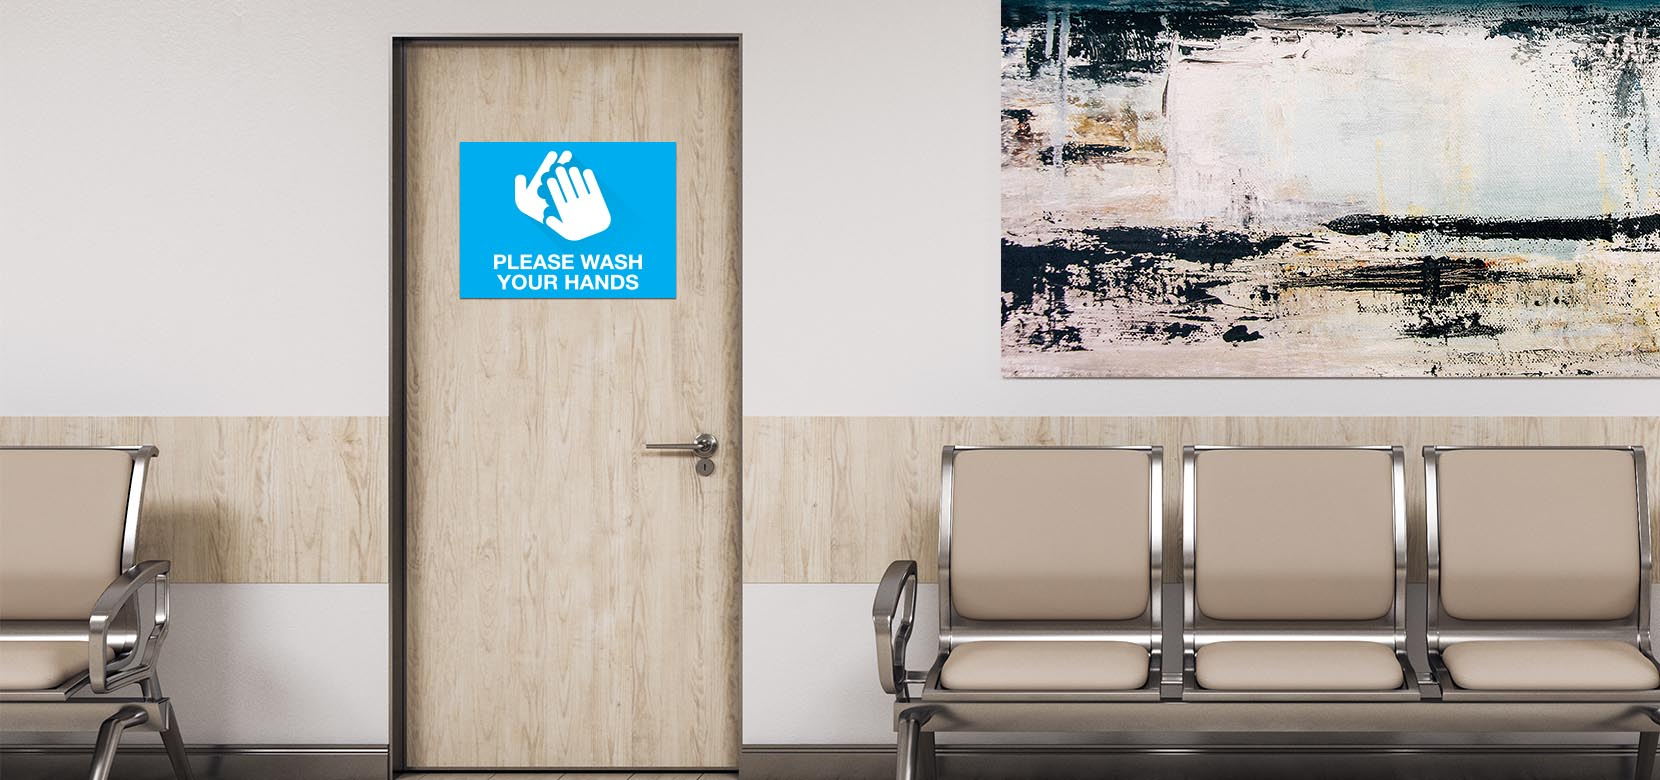 Wash Hands - ePanel 18x24